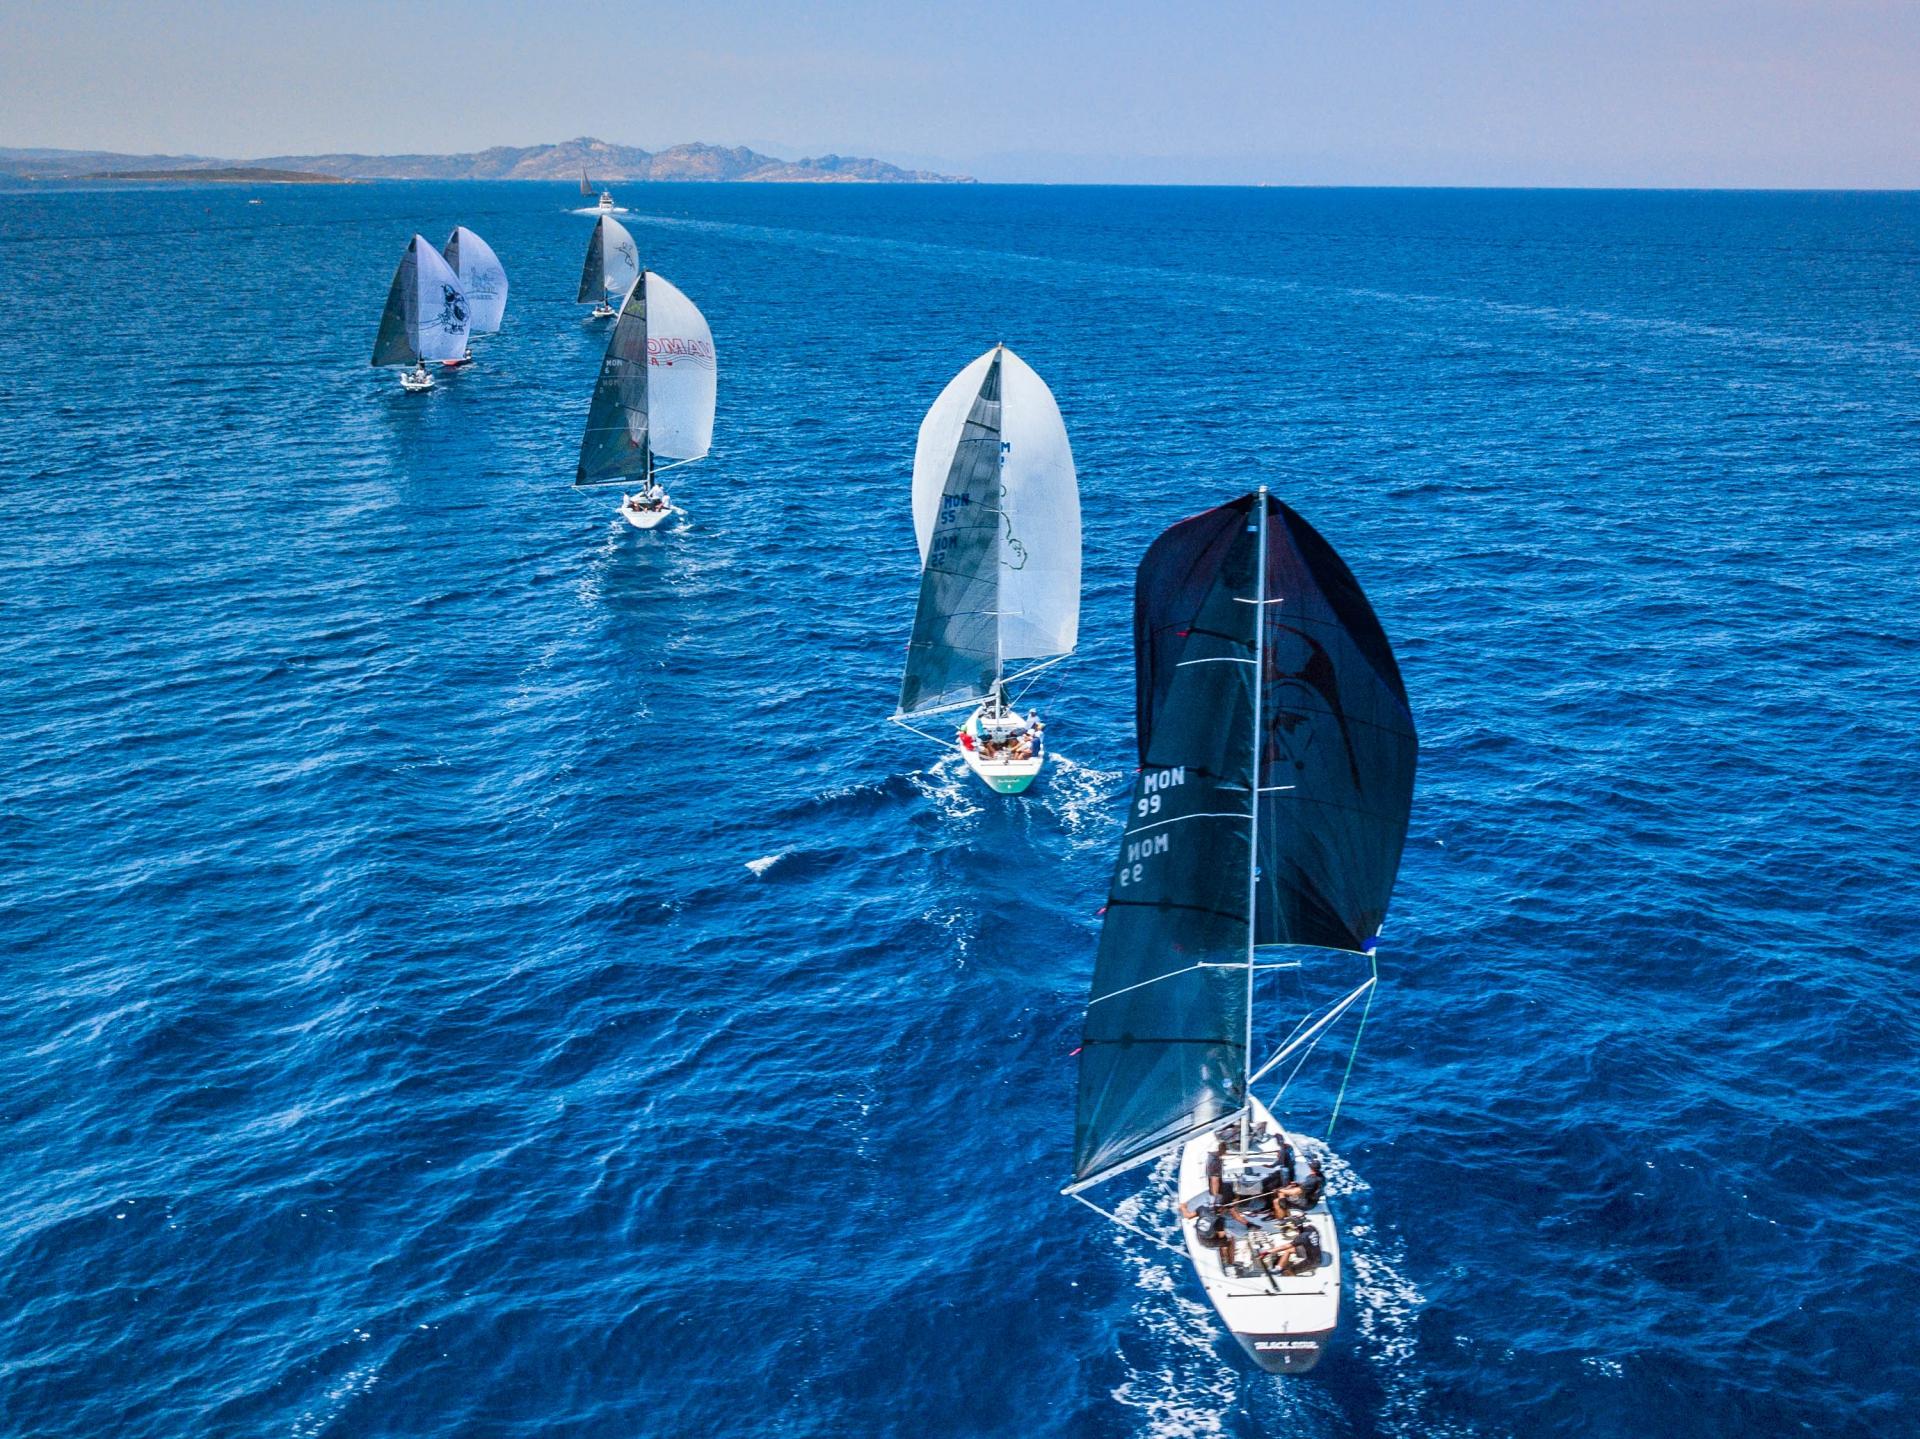 Al via l'Invitational Smeralda 888 - NEWS - Yacht Club Costa Smeralda